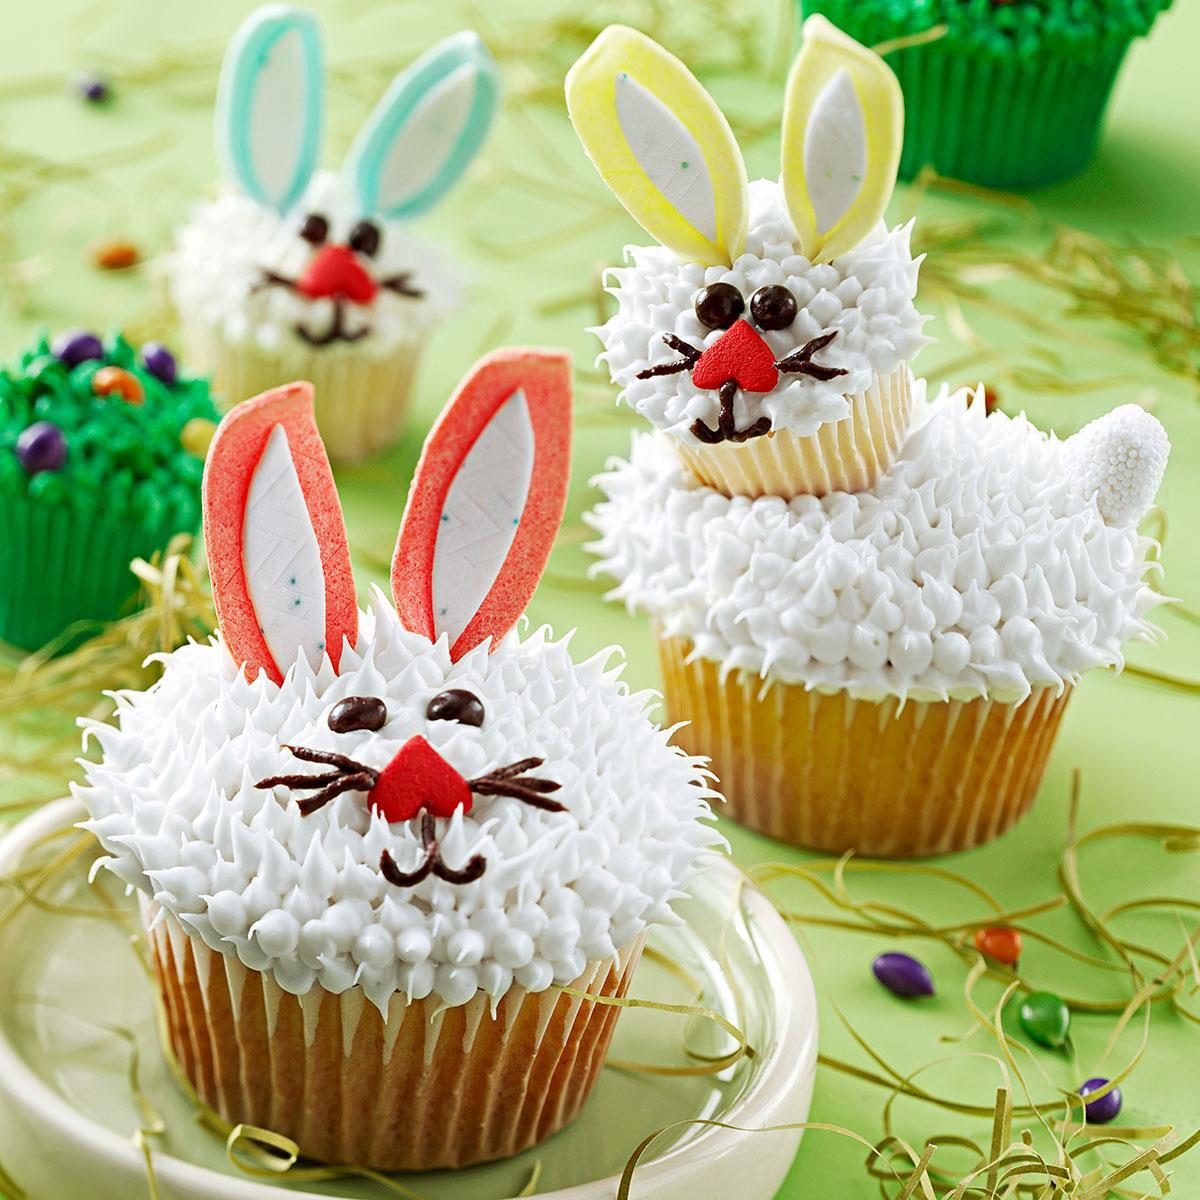 Easter Bunny Cupcakes  Easter Bunny Cupcakes Recipe